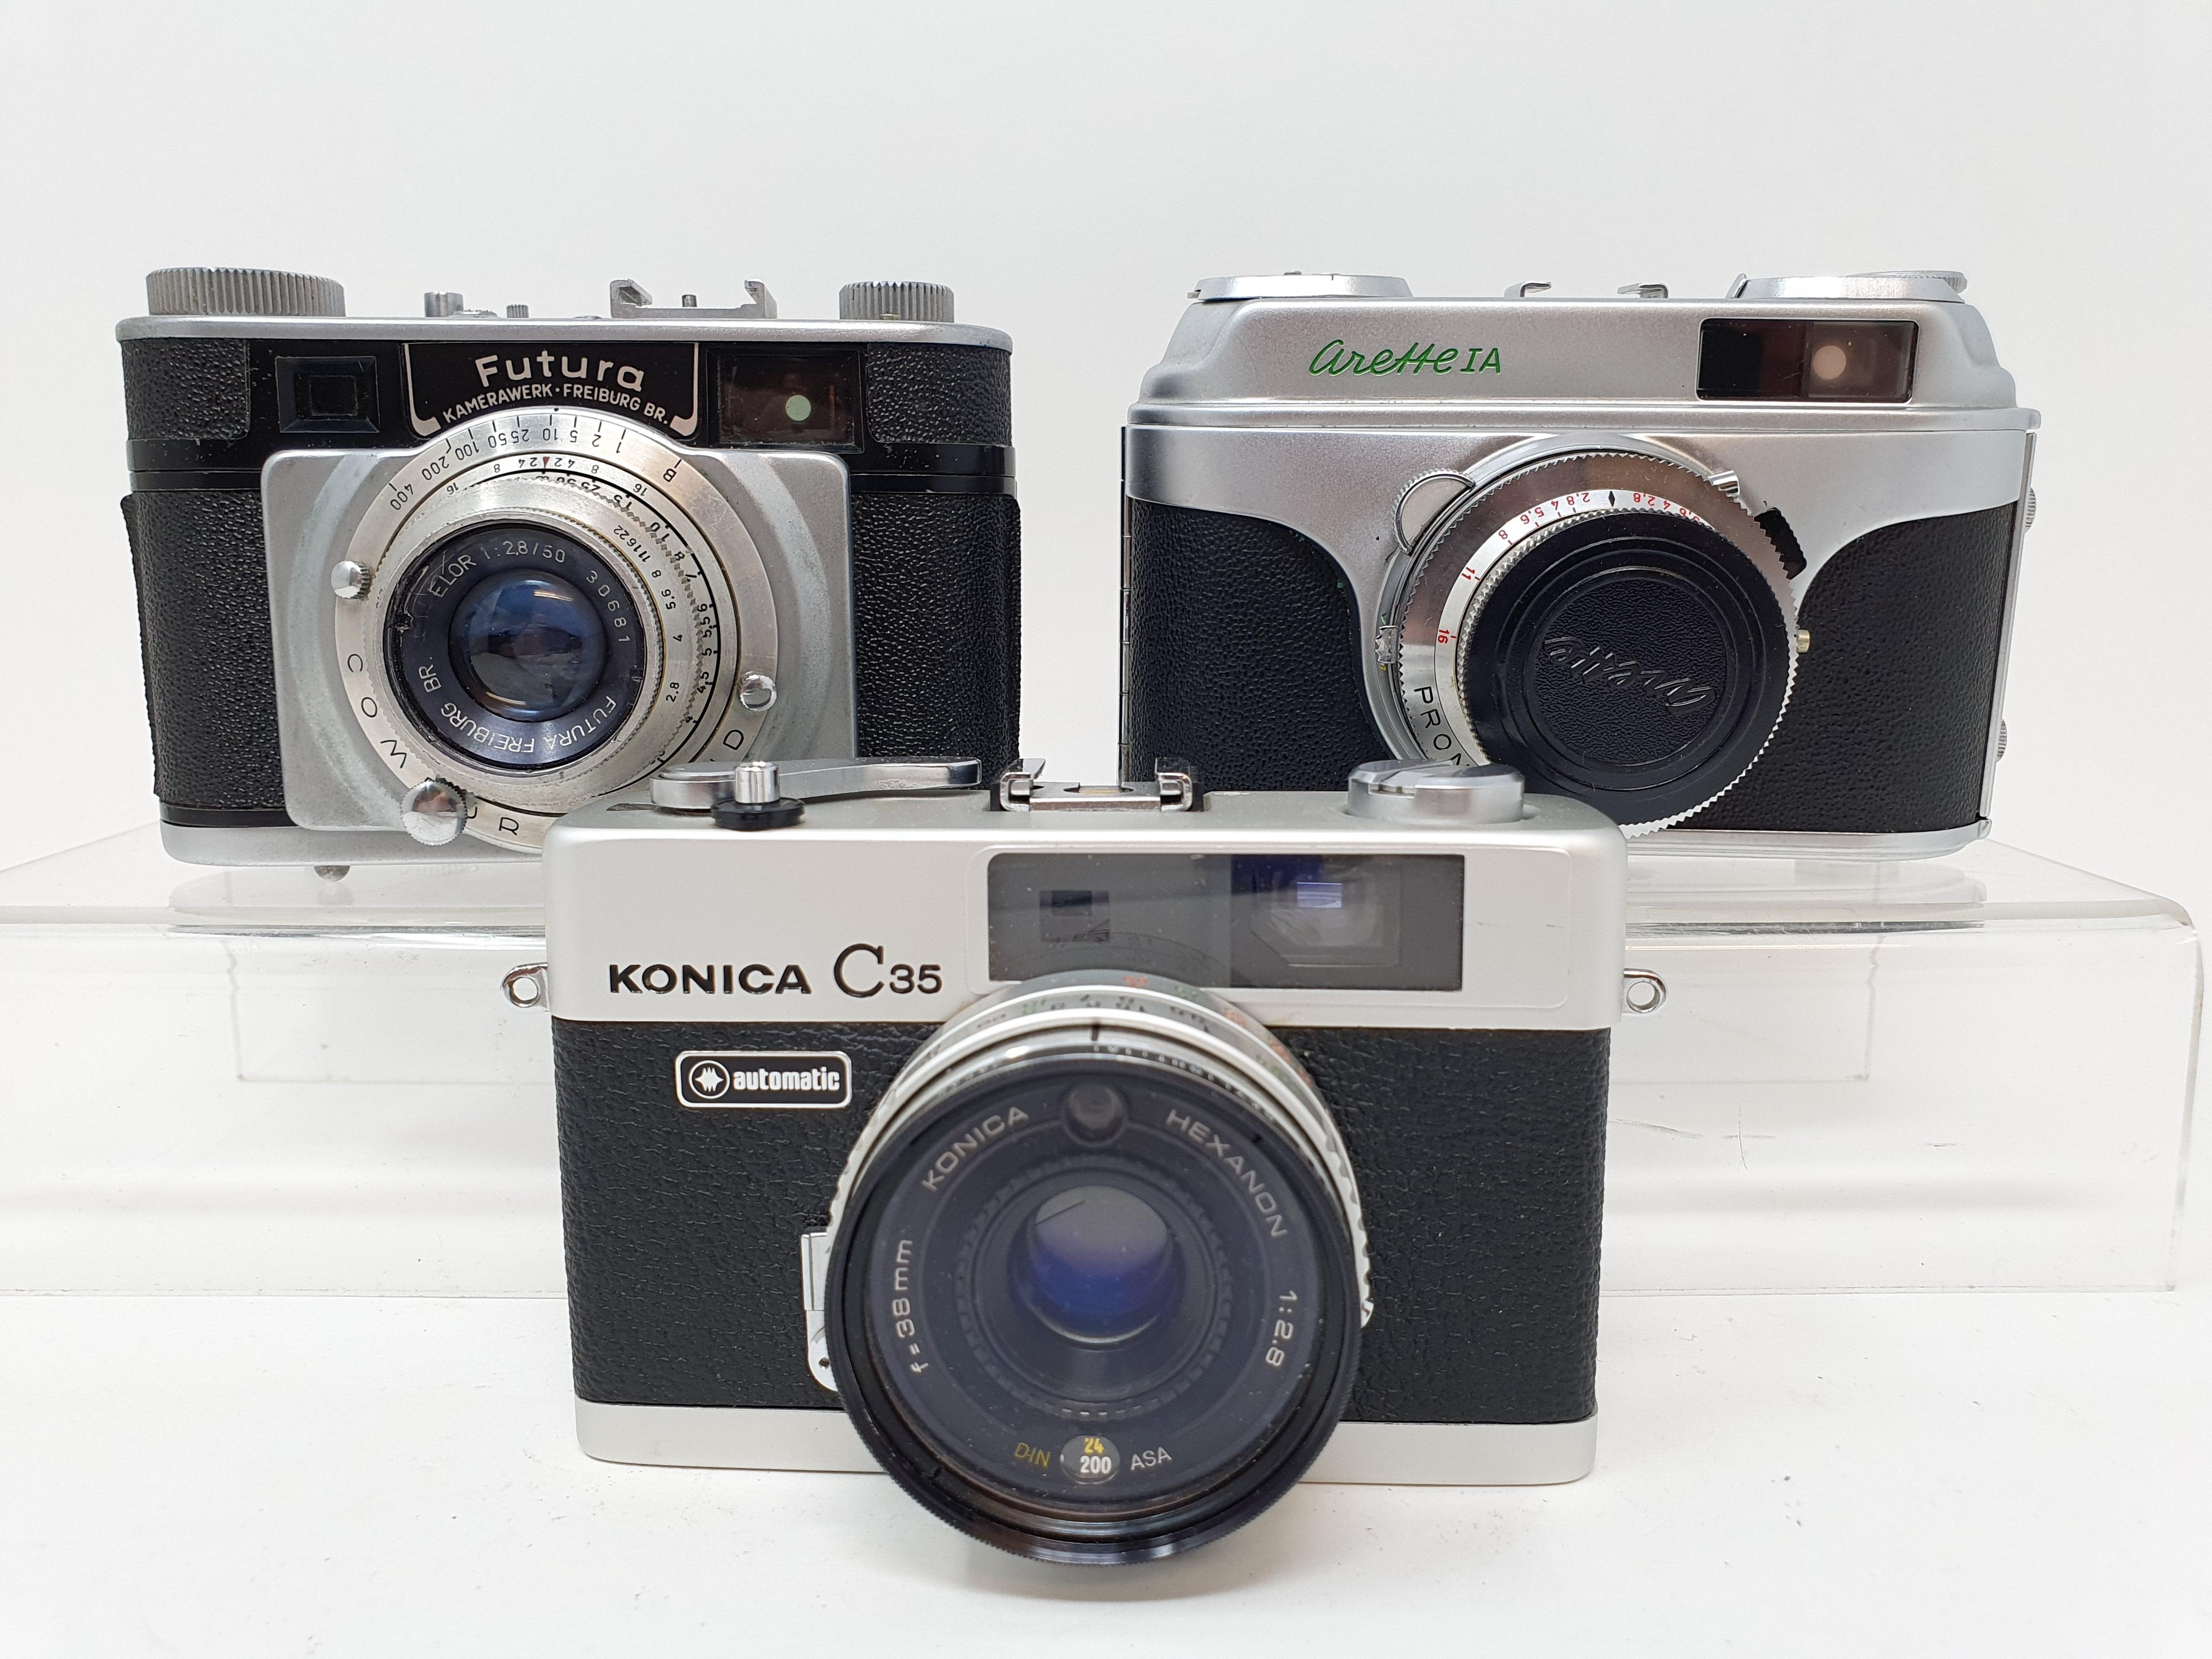 A Konica C35 camera, a Futura camera and a Arette IA camera (3) Provenance: Part of a vast single